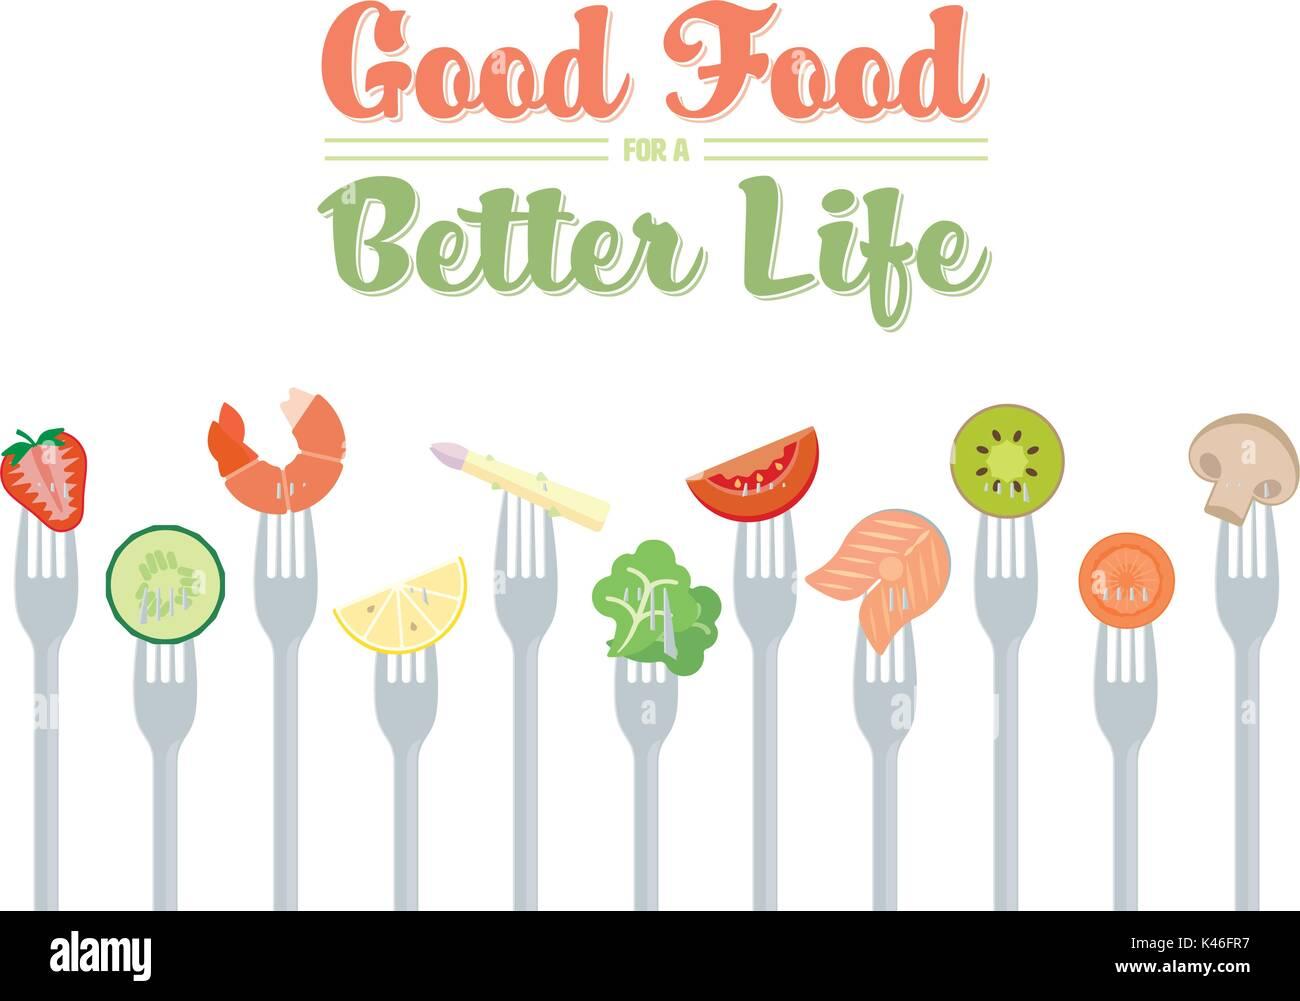 Diet Food Stock Vector Images - Alamy